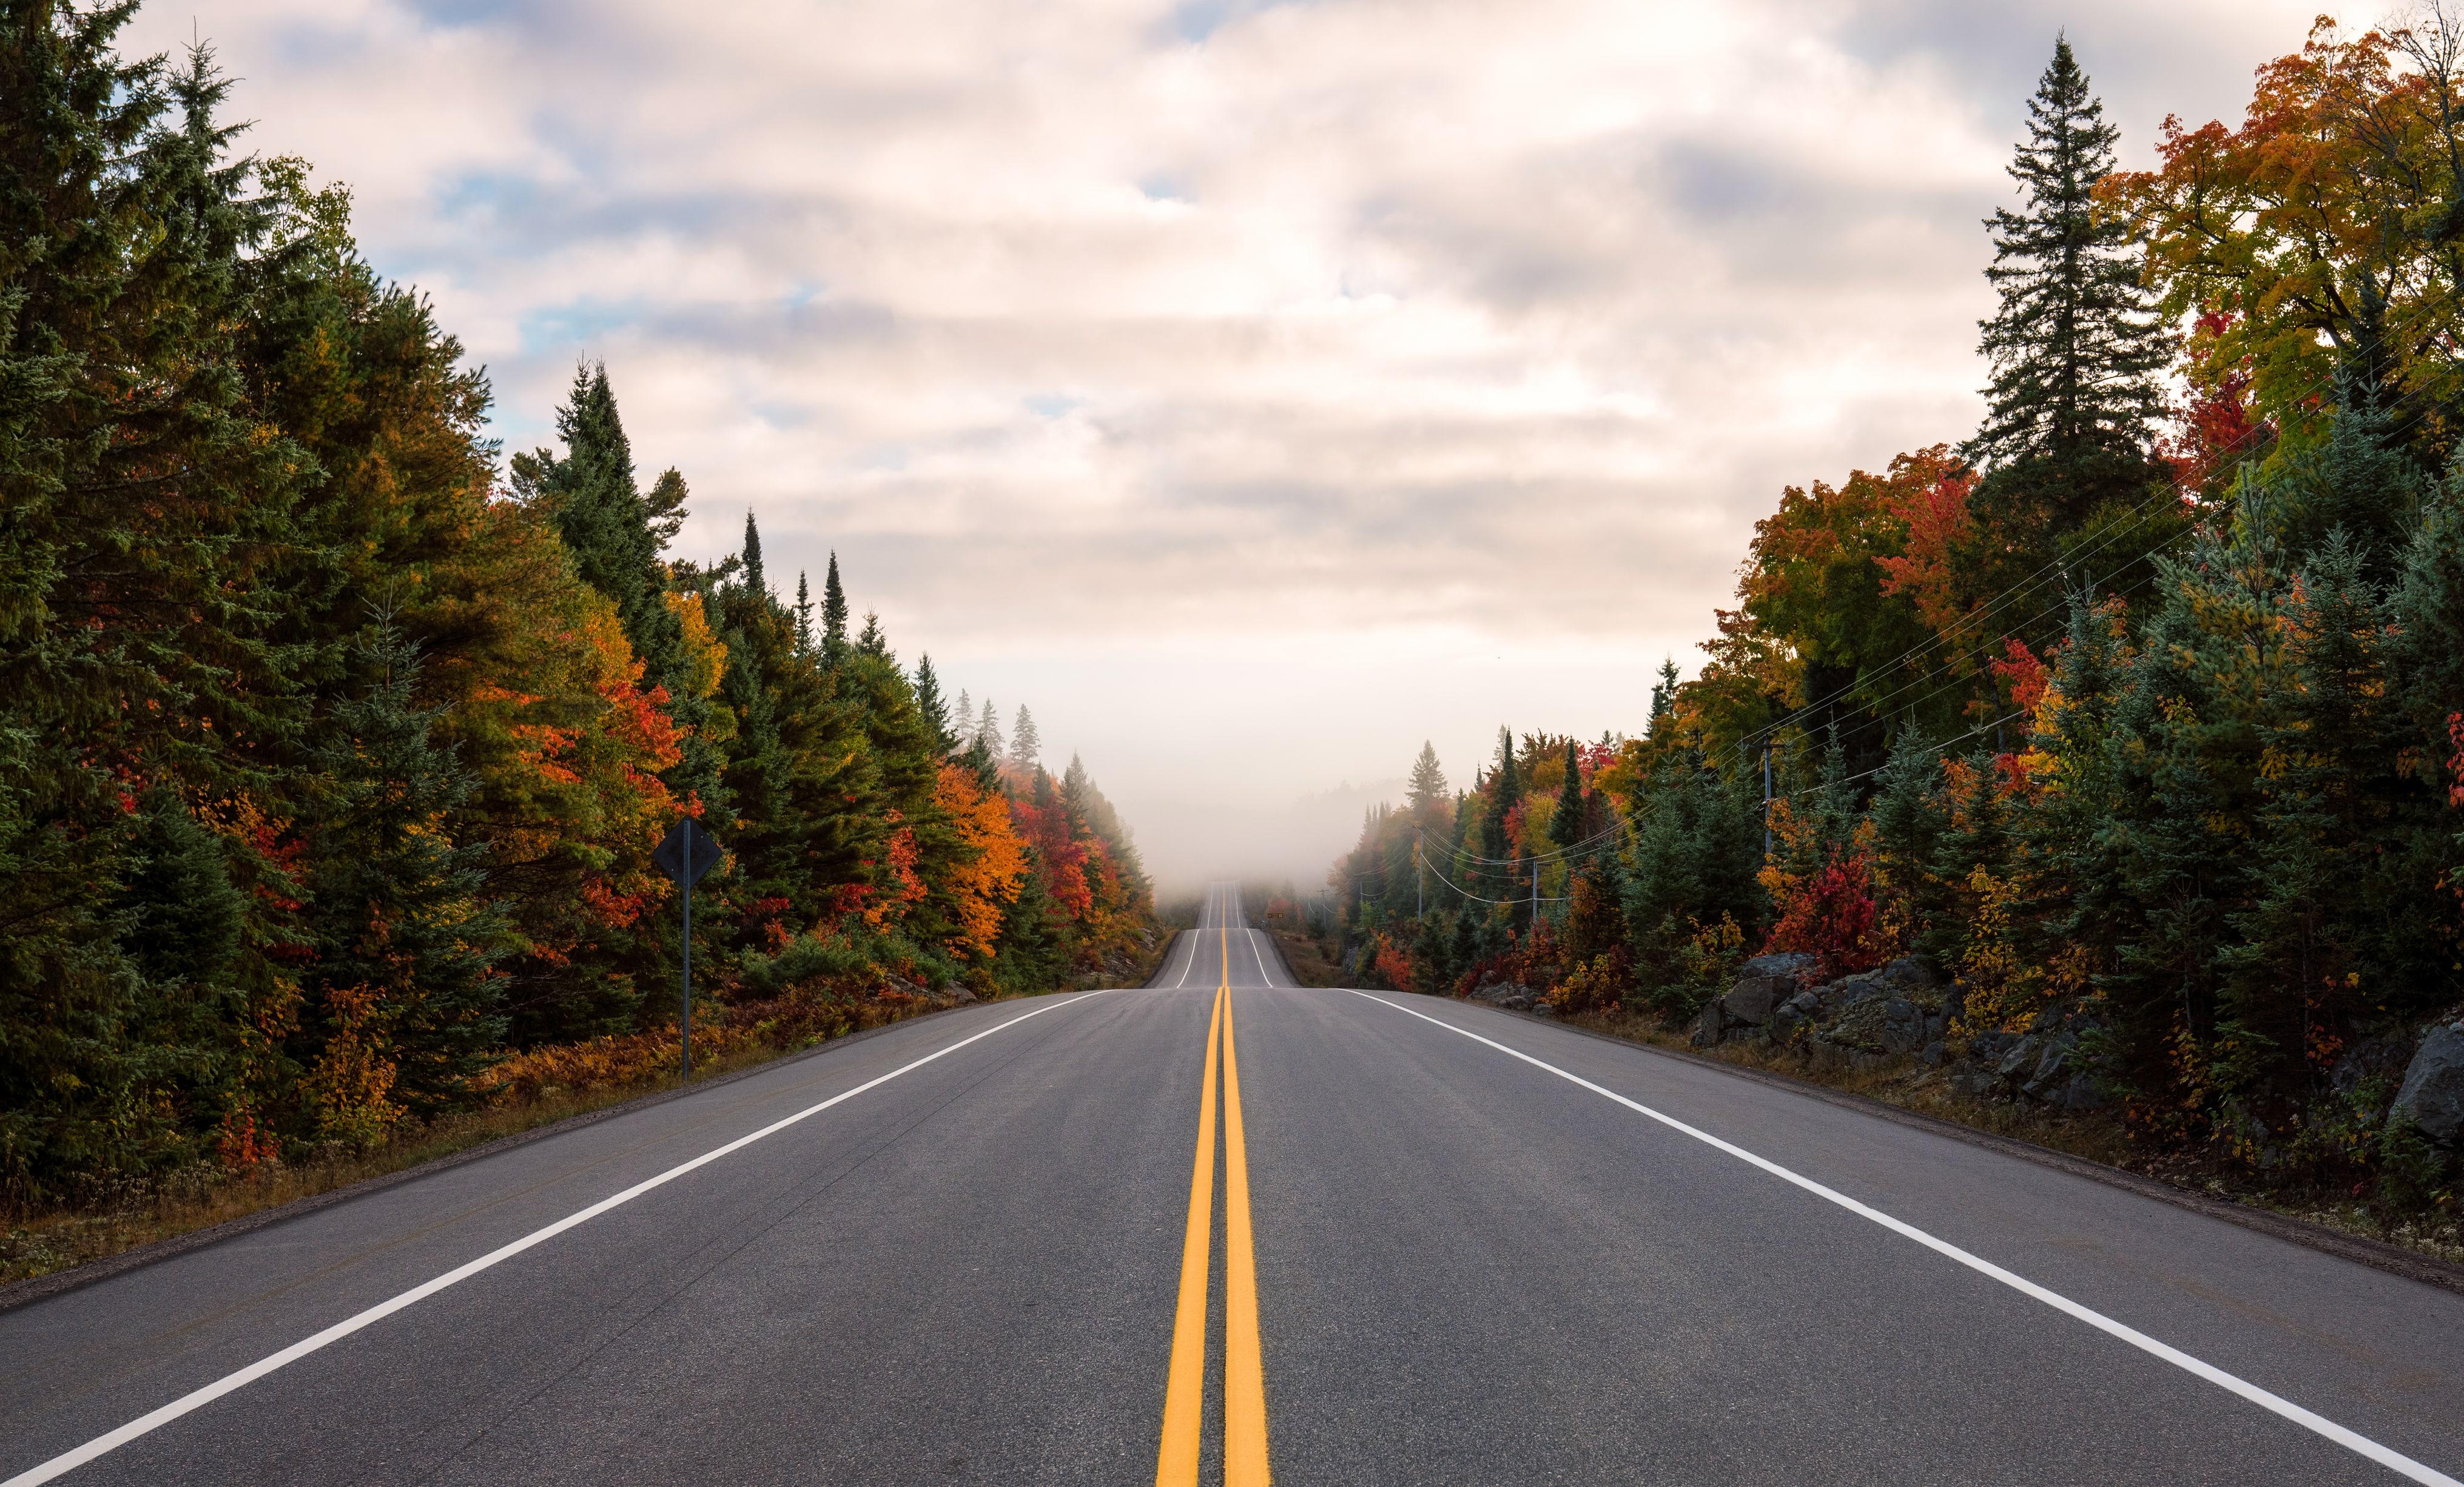 Empty backroad during Fall season